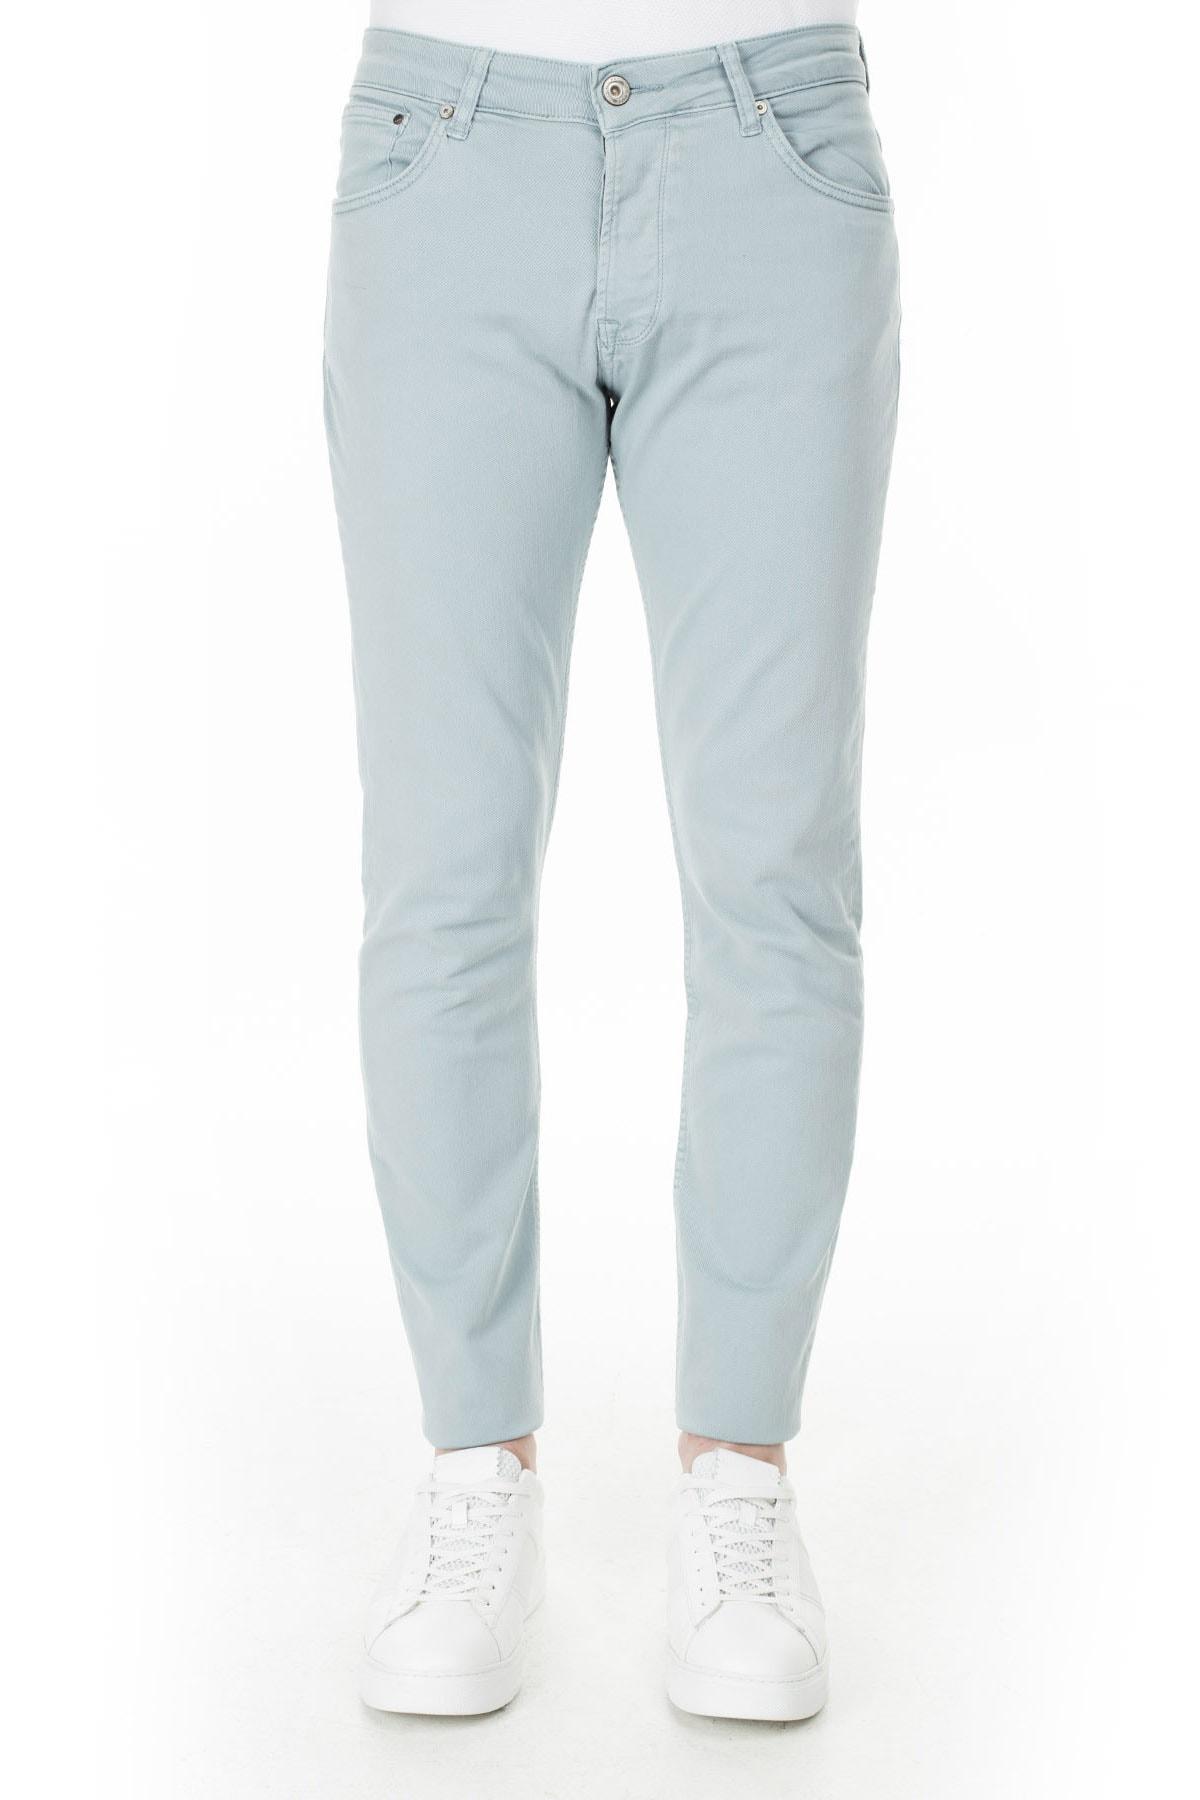 Buratti Erkek AÇIK MAVİ Normal Bel Dar Paça Slim Fit Jeans Pamuklu Kot Pantolon 7299F0287ARTOS 2